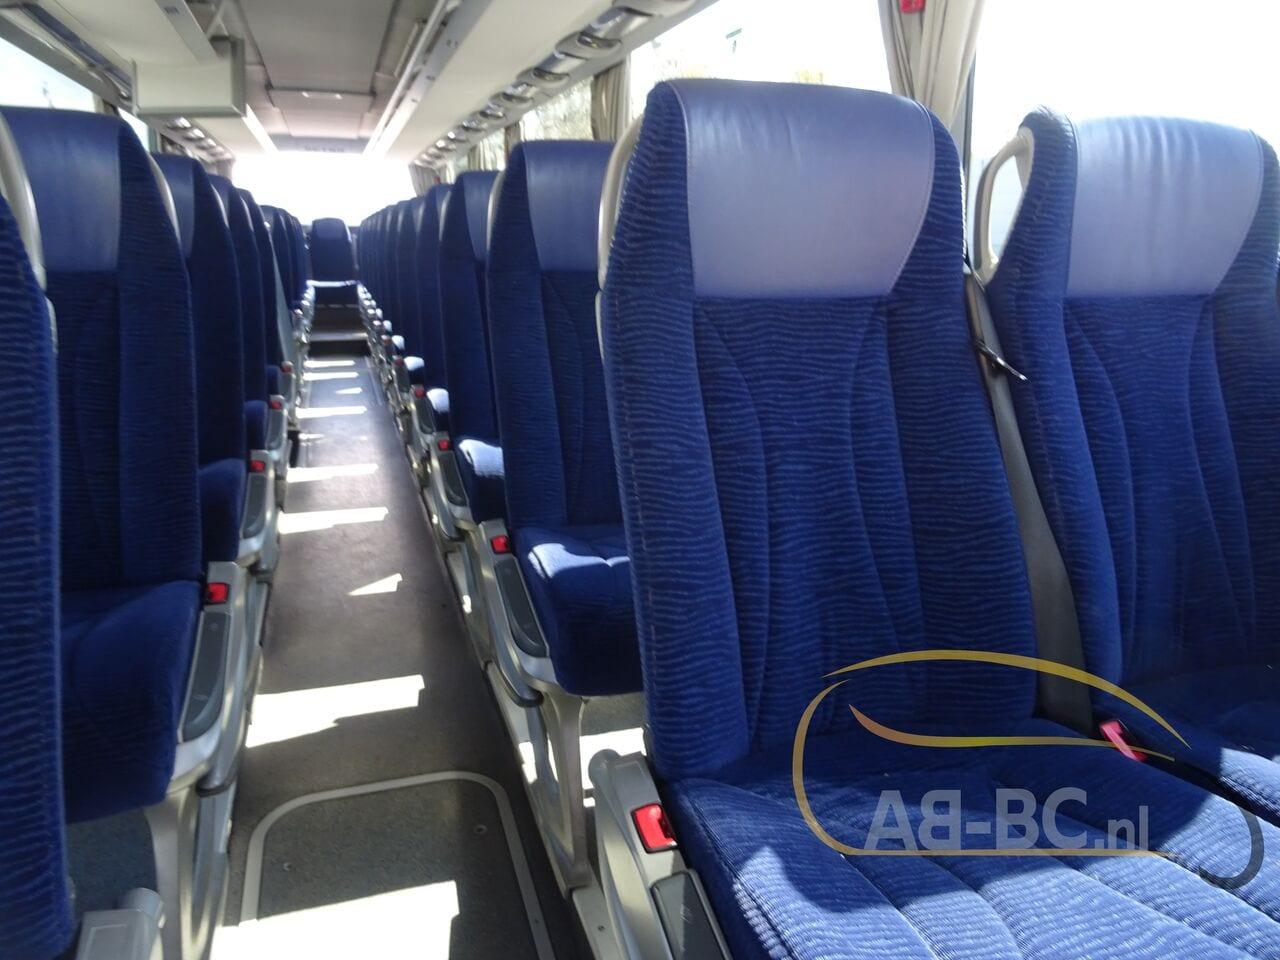 coach-busSETRA-S415-GT-HD-FINAL-EDITION-51-SEATS-LIFTBUS---1620382028905761666_big_7ed9a36a9e71c1a51ed1c06ae0b85c43--21050713010665719300